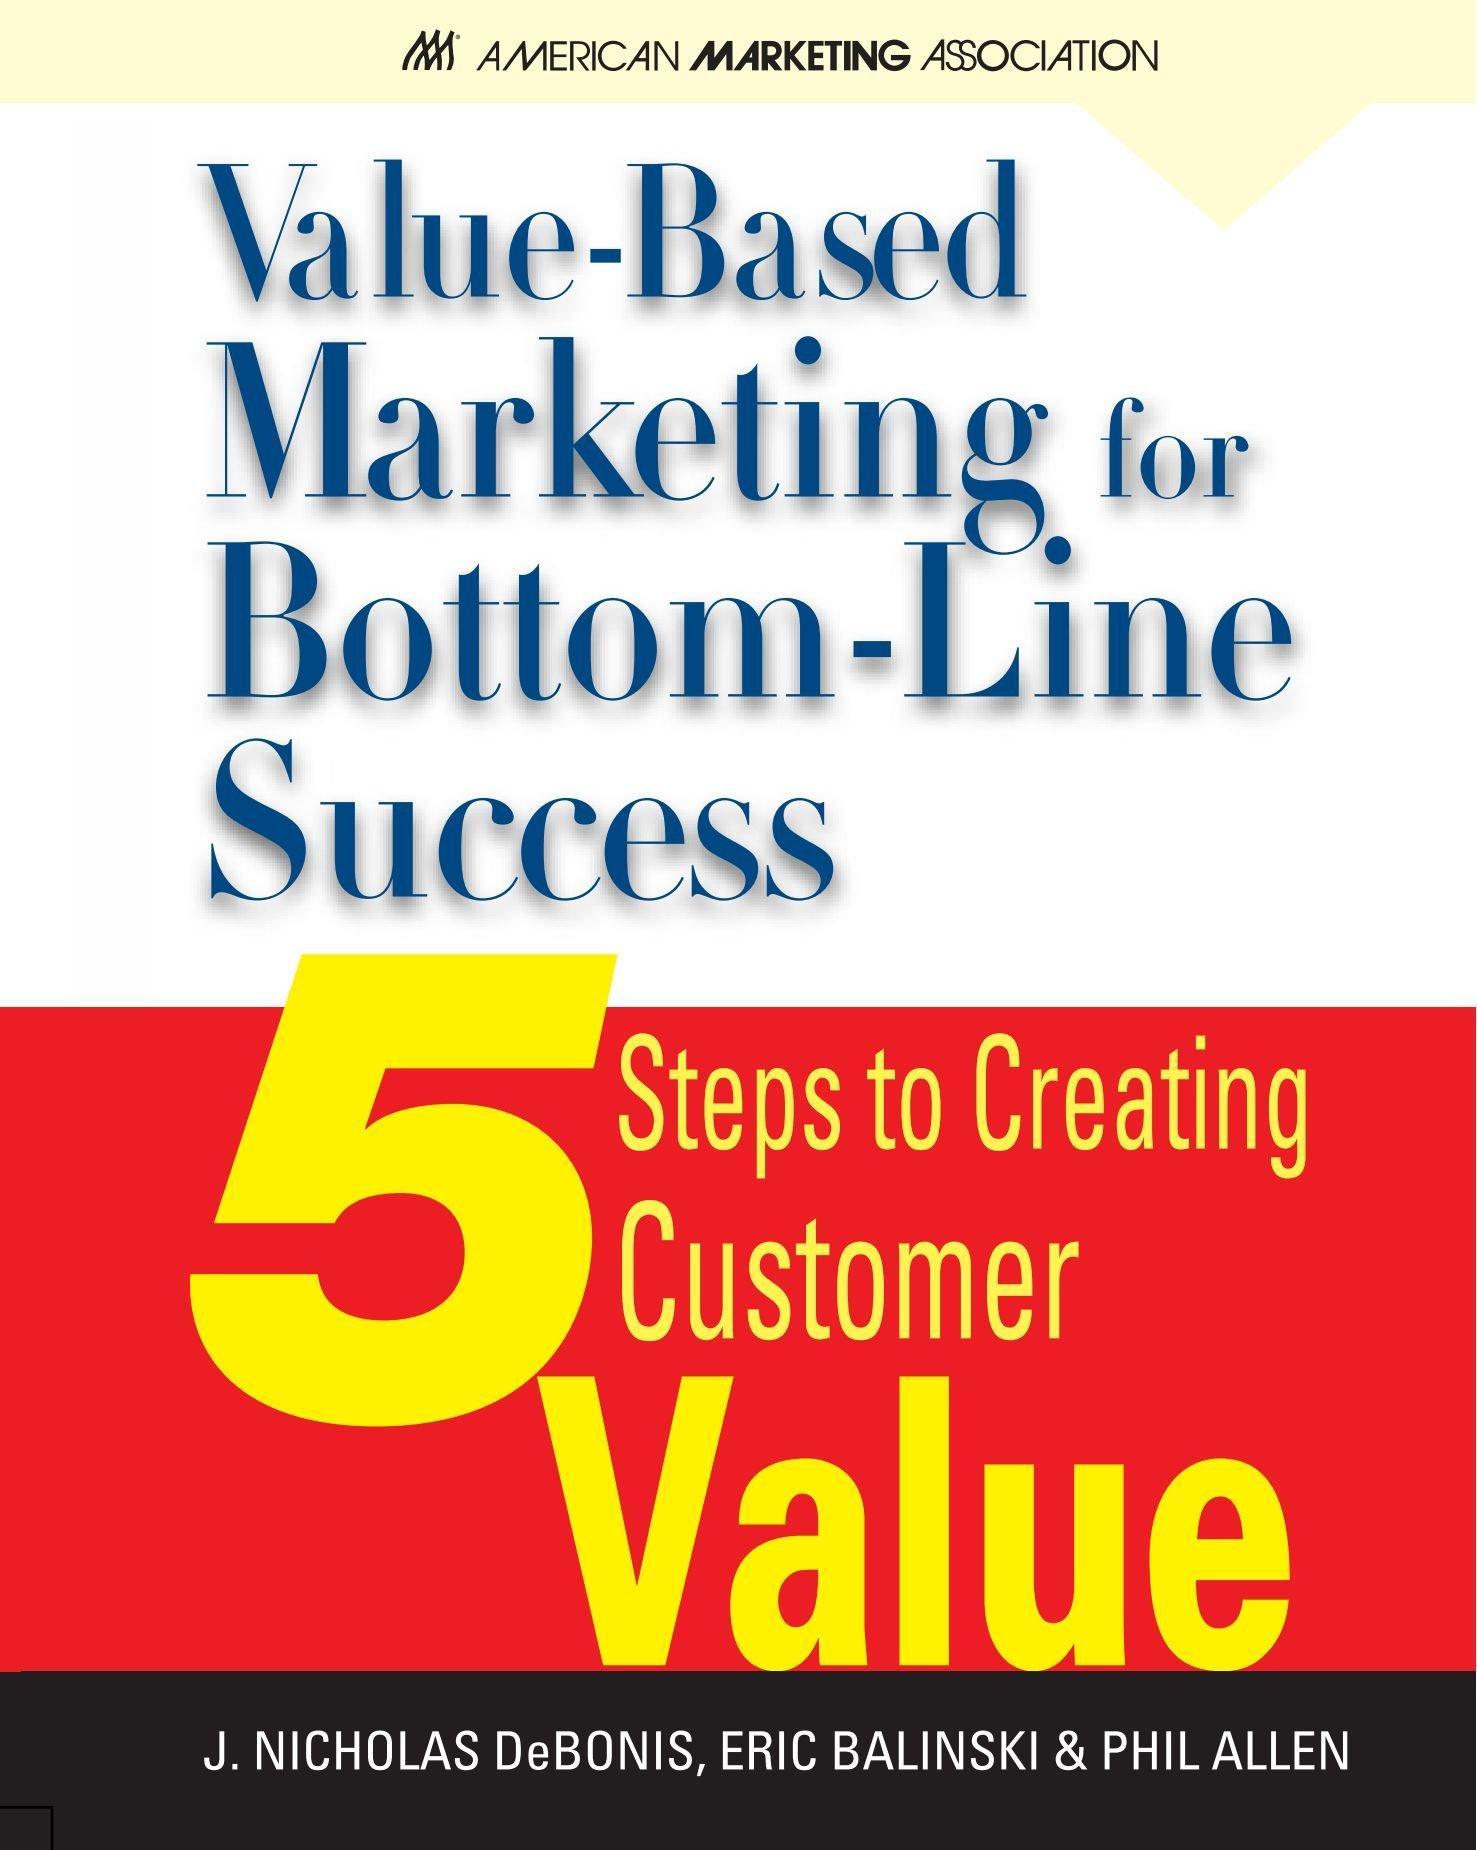 Value-Based Marketing for Bottom-Line Success ebook